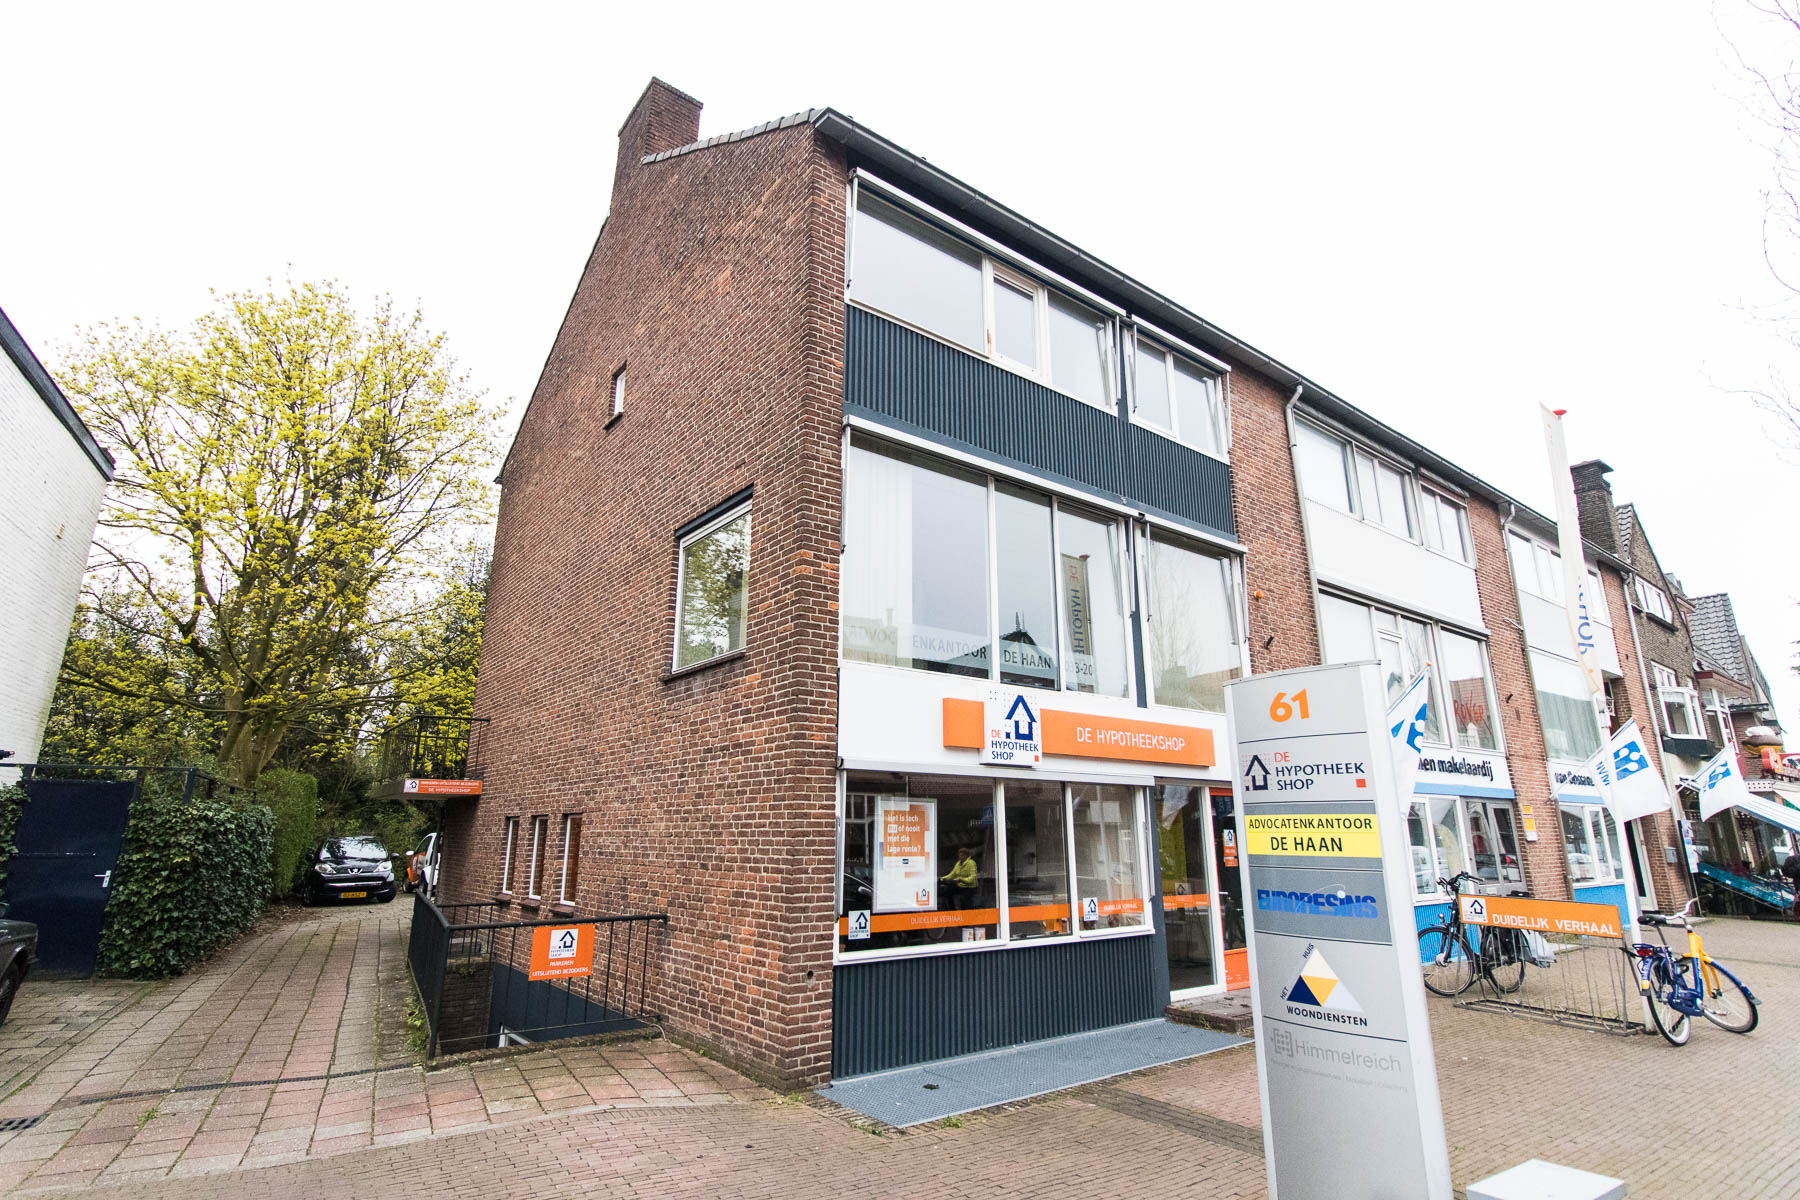 Rent office space Utrechtseweg 61, Amersfoort (15)